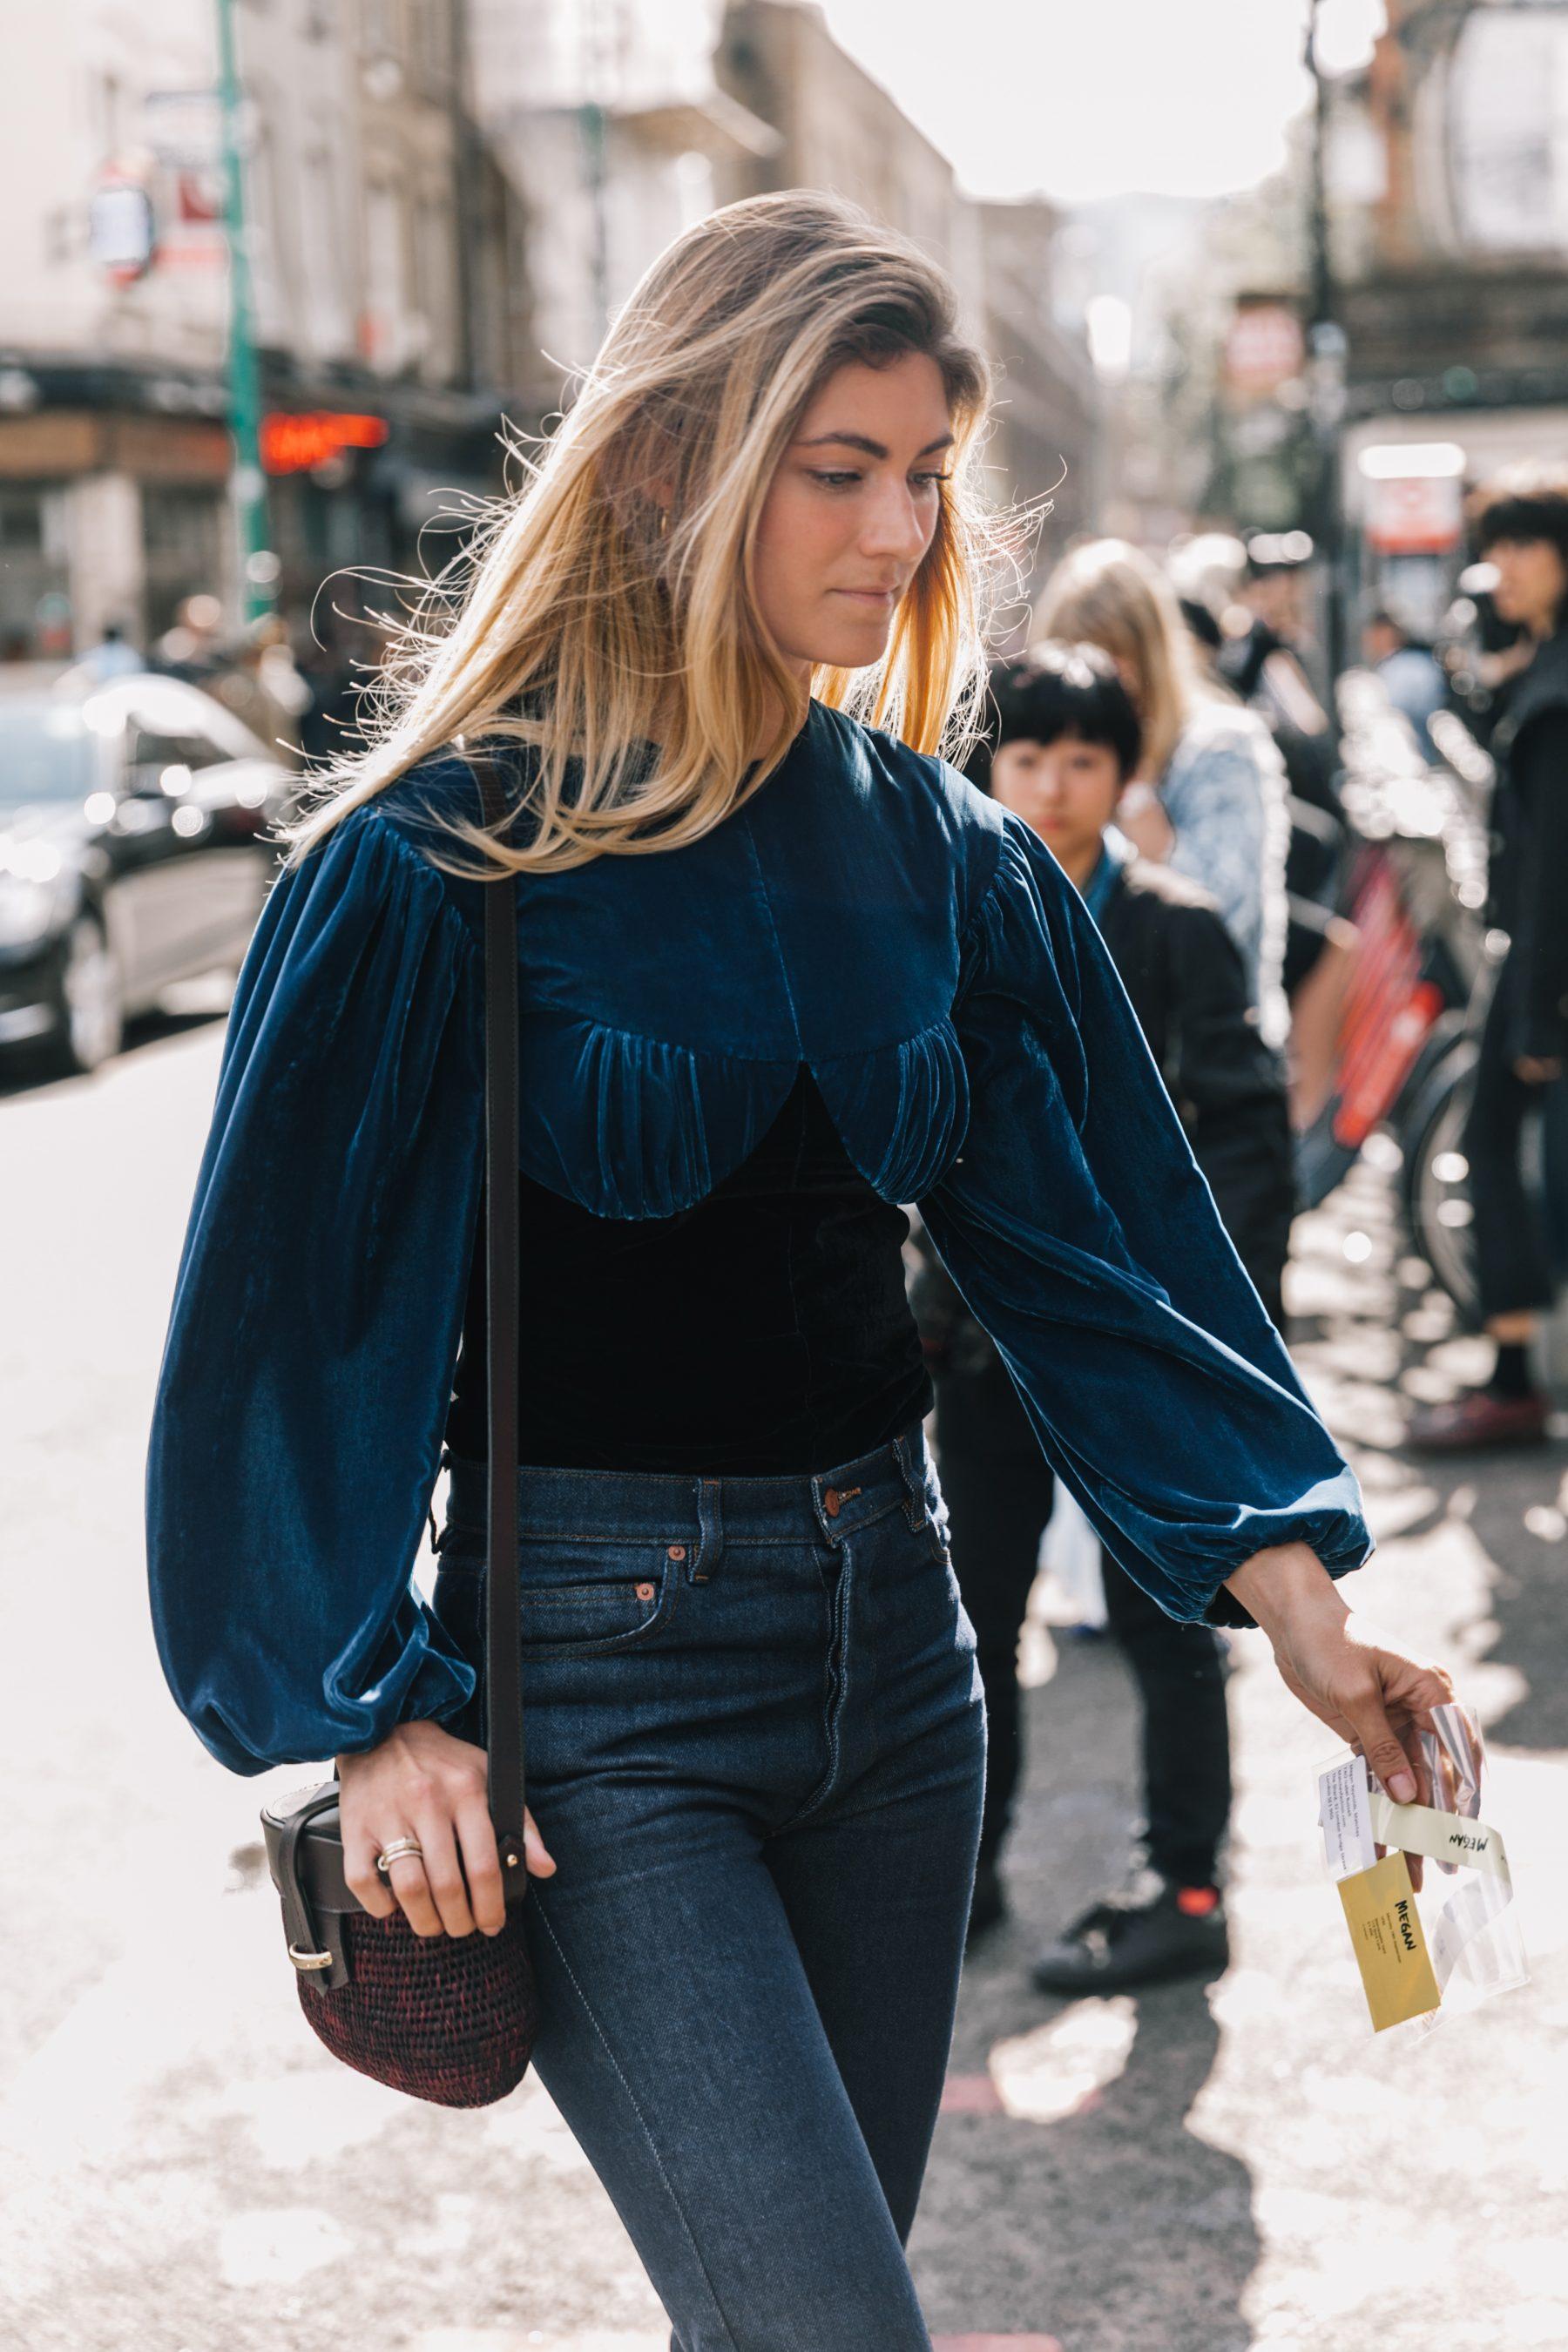 LFW-SS18-London_Fashion_Week-Street_Style-Vogue-Collage_Vintage-110-1-1800x2700.jpg